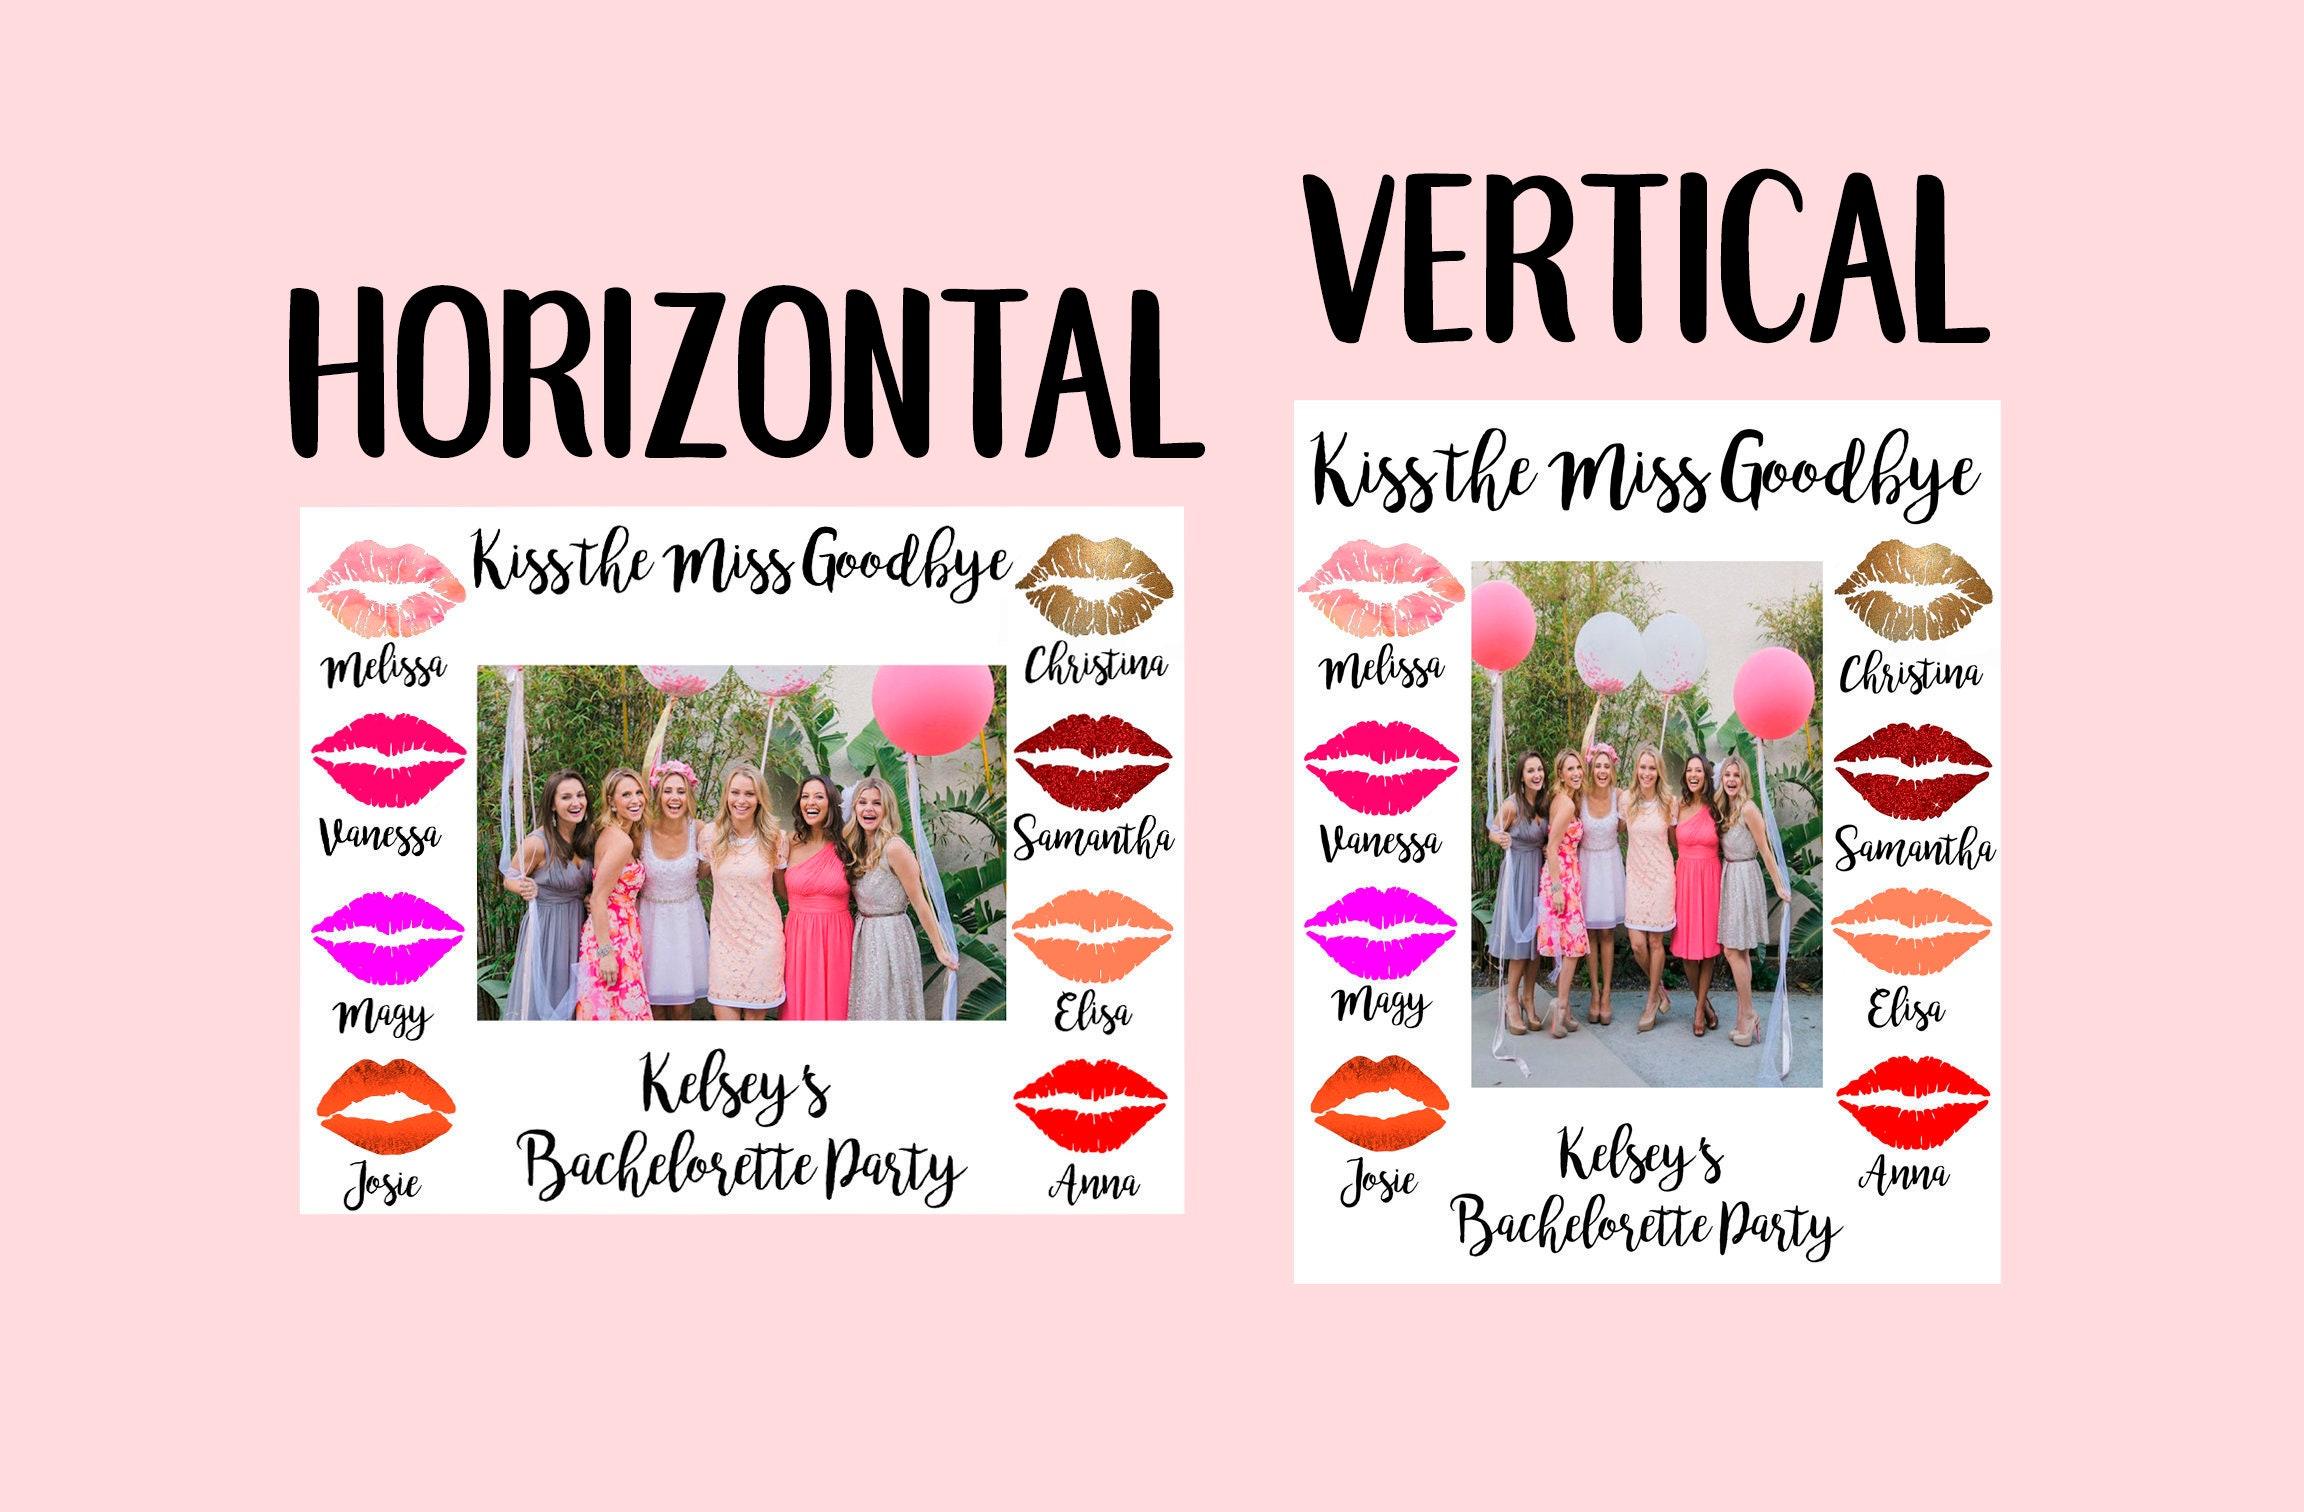 Kiss the Miss Goodbye Photo Frame Bachelorette Party Photo | Etsy